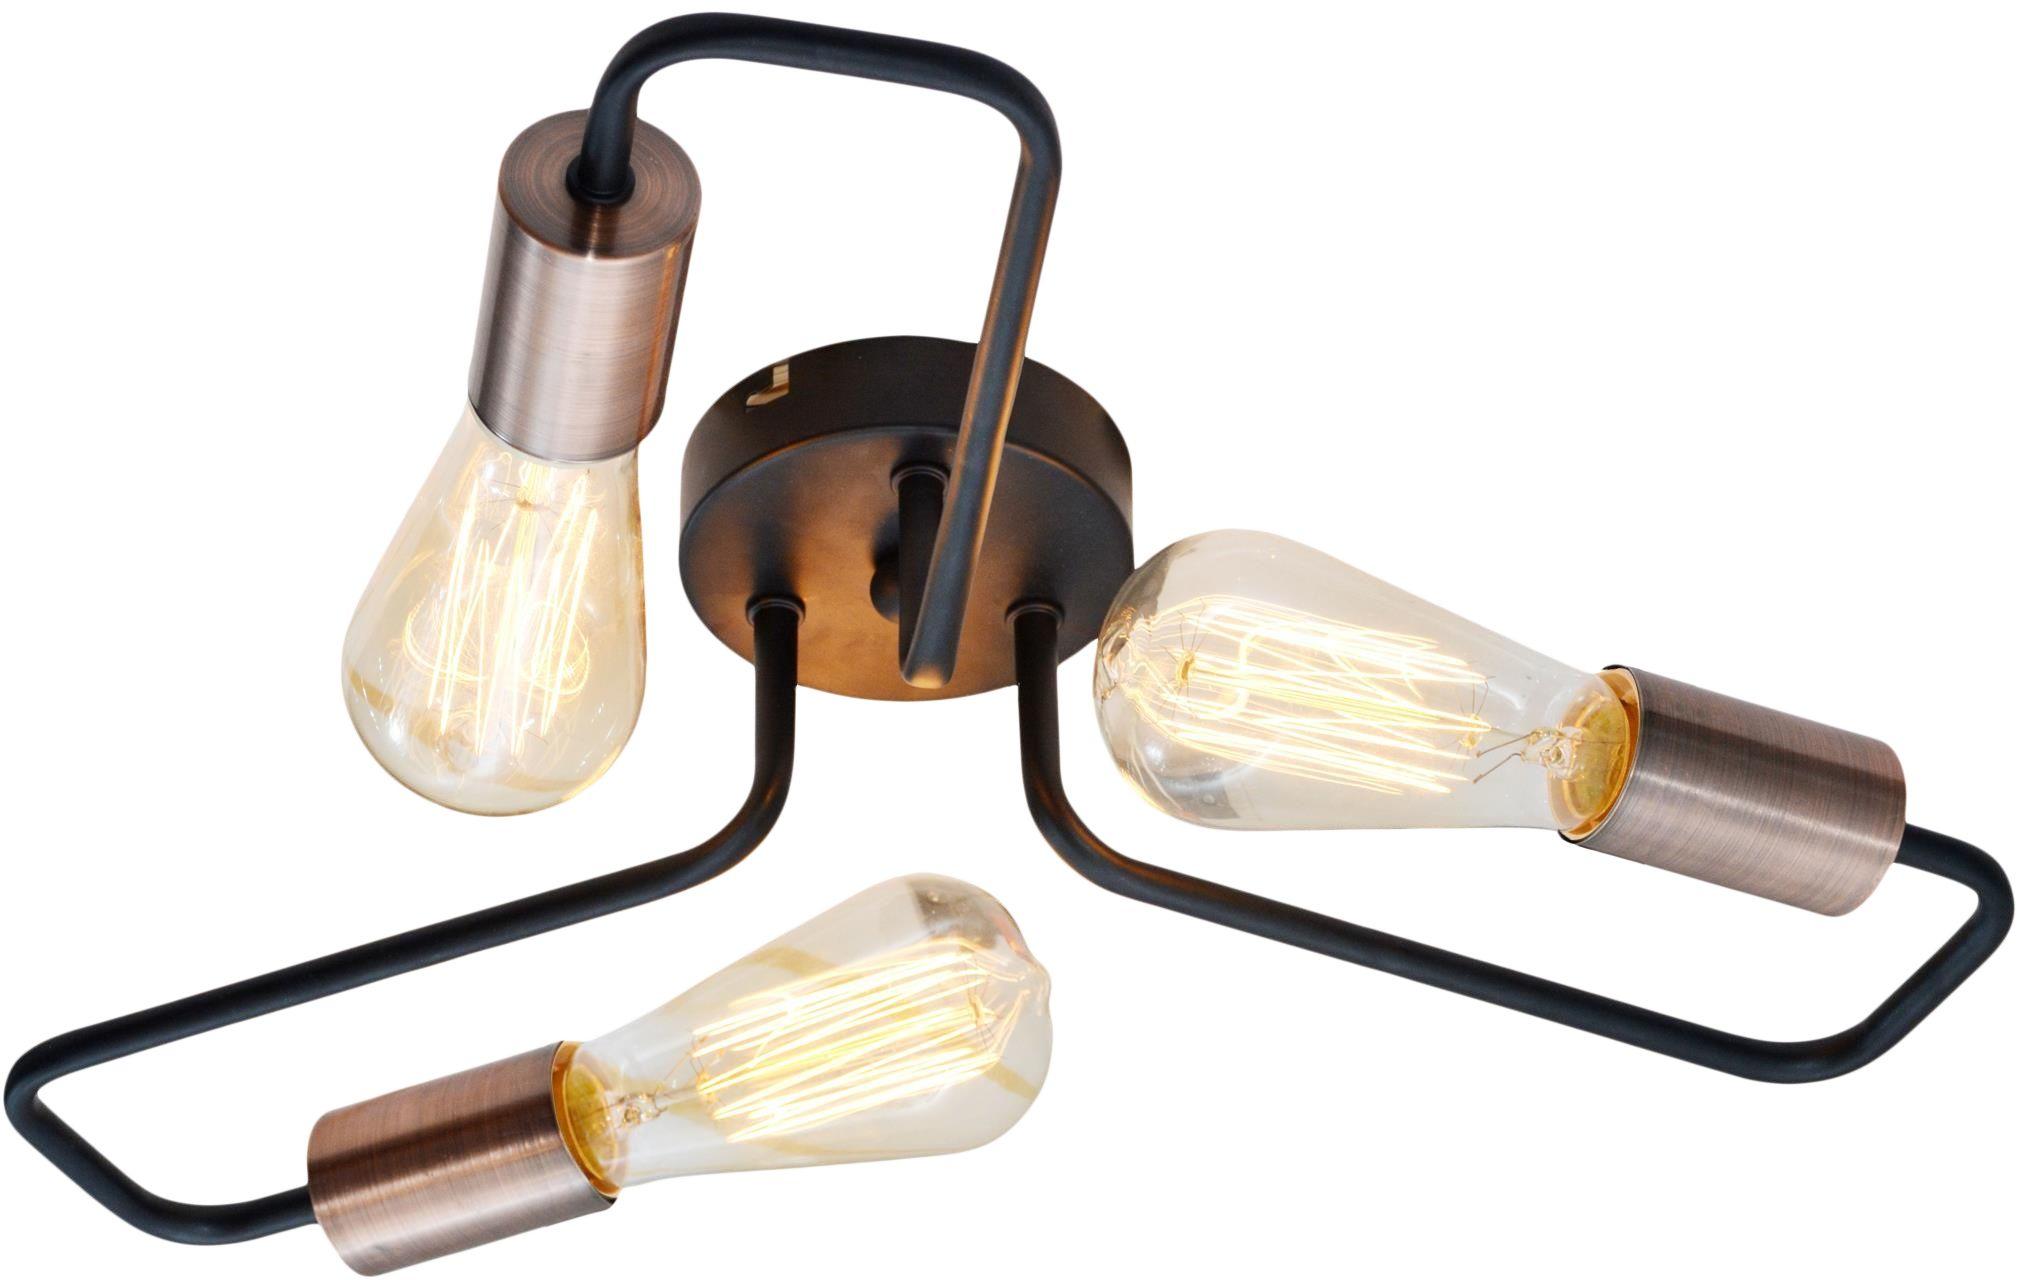 Candellux HERPE 33-66916 plafon lampa sufitowa czarna 3X60W E27 48cm